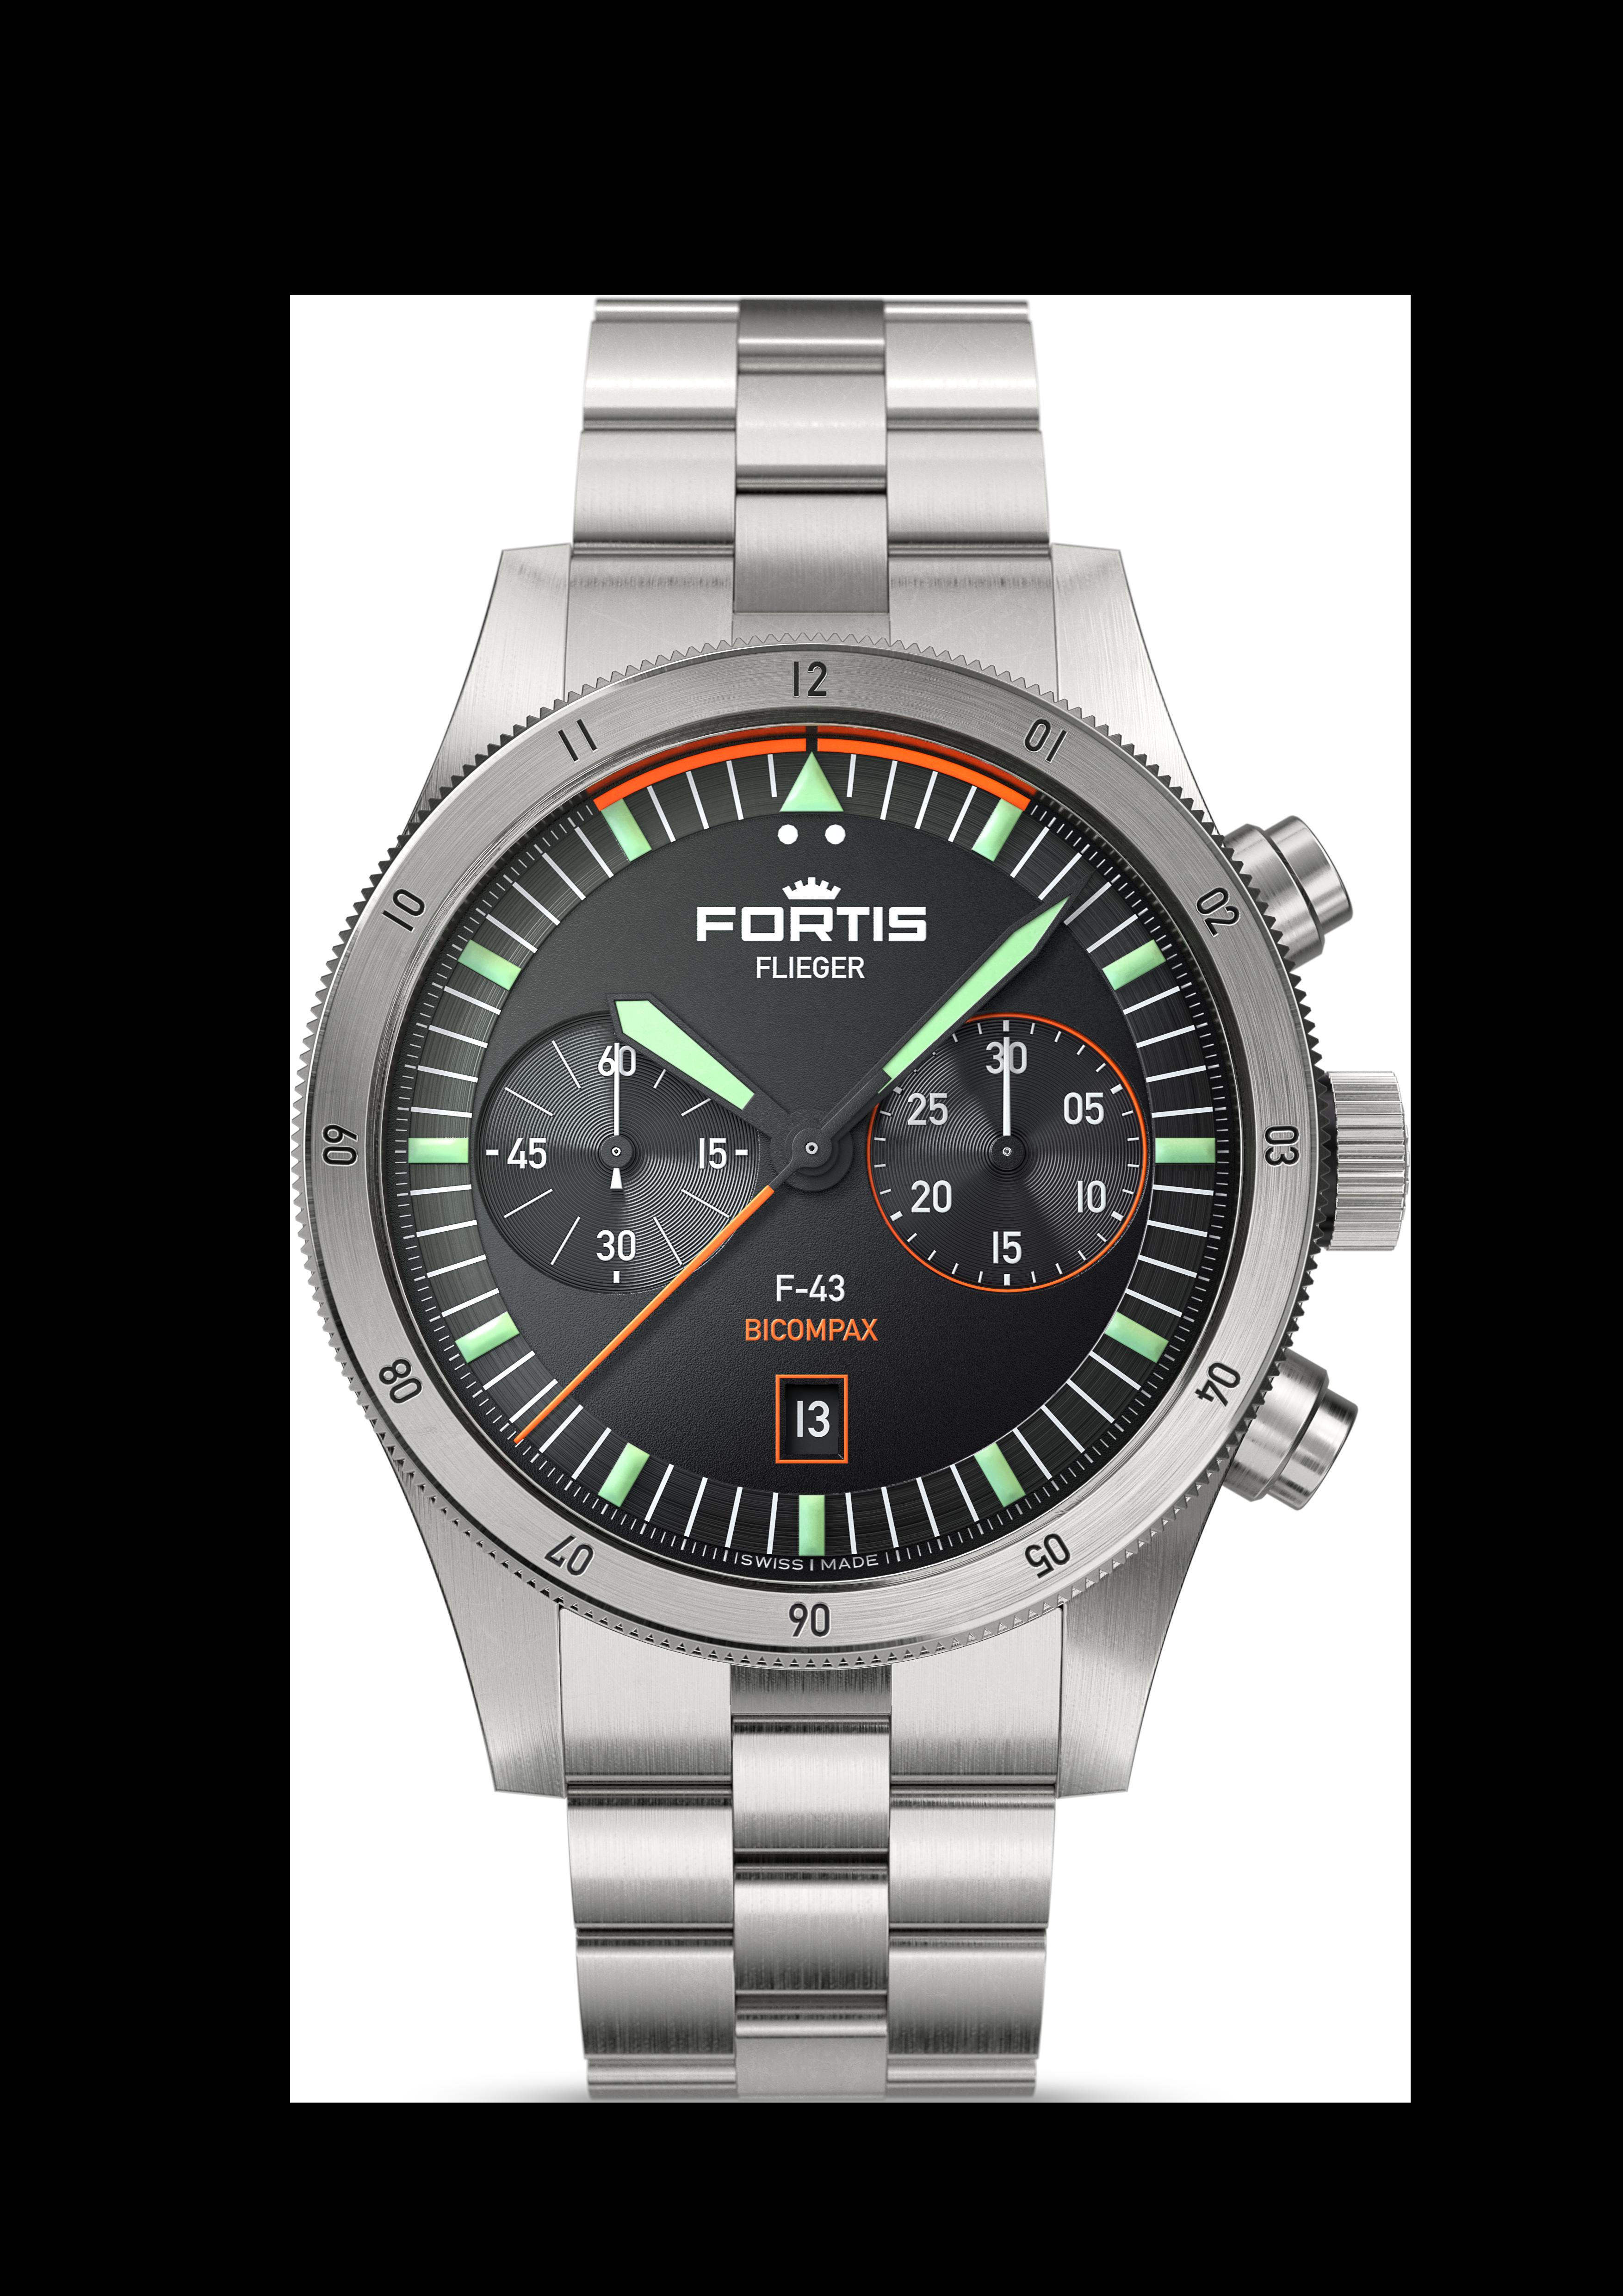 Fortis FLIEGER F-43 BICOMPAX, Ref. F.424.0004